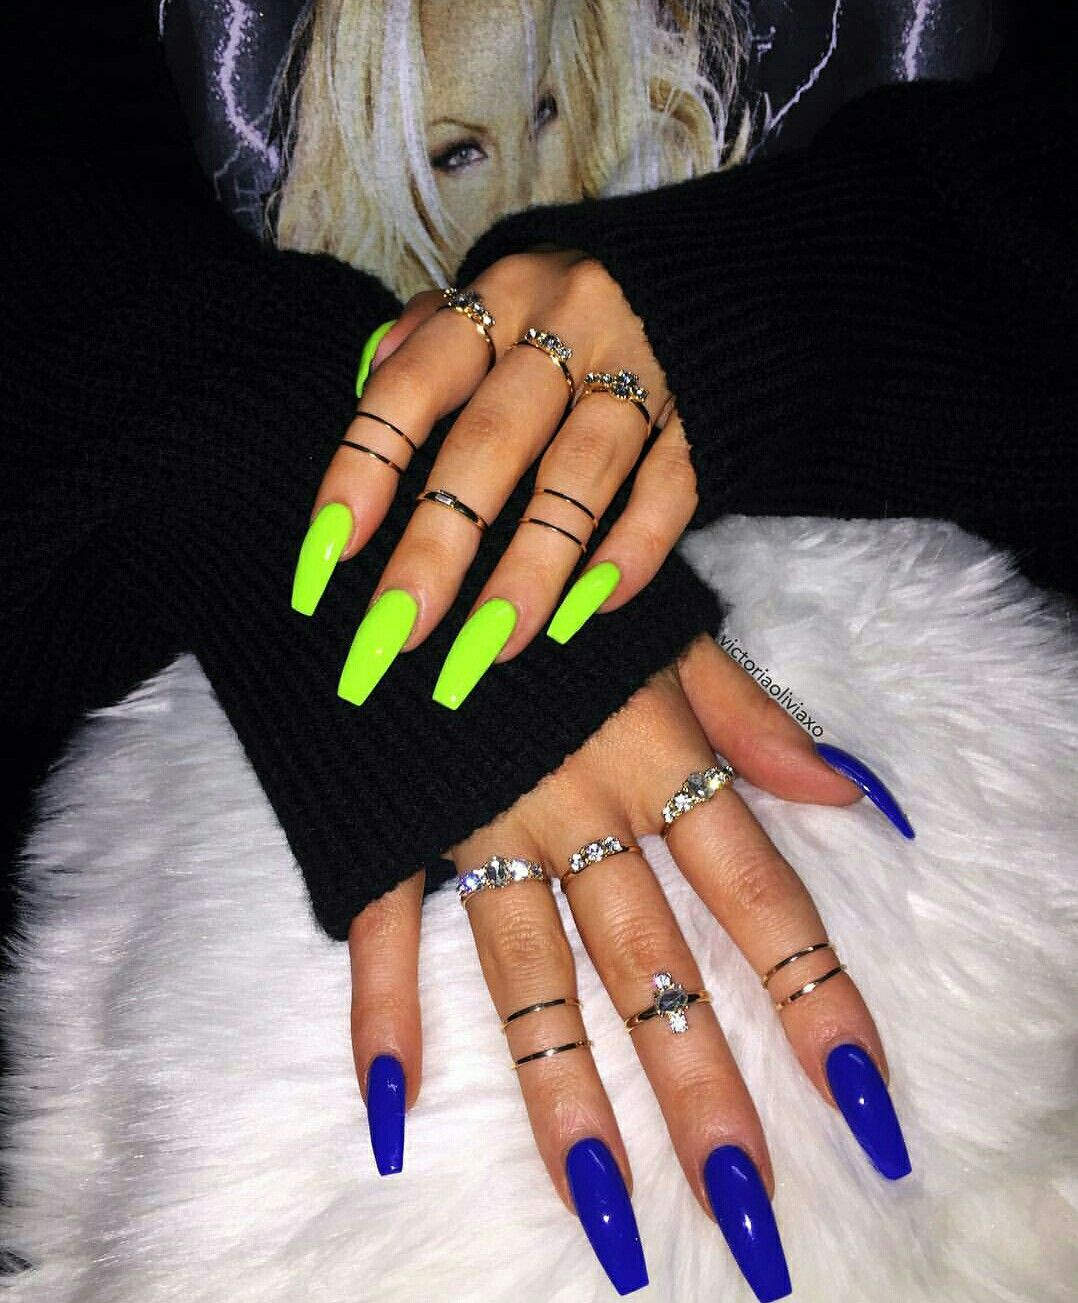 Pin by Valentine garnero on ongles | Pinterest | Nail inspo, Nail ...